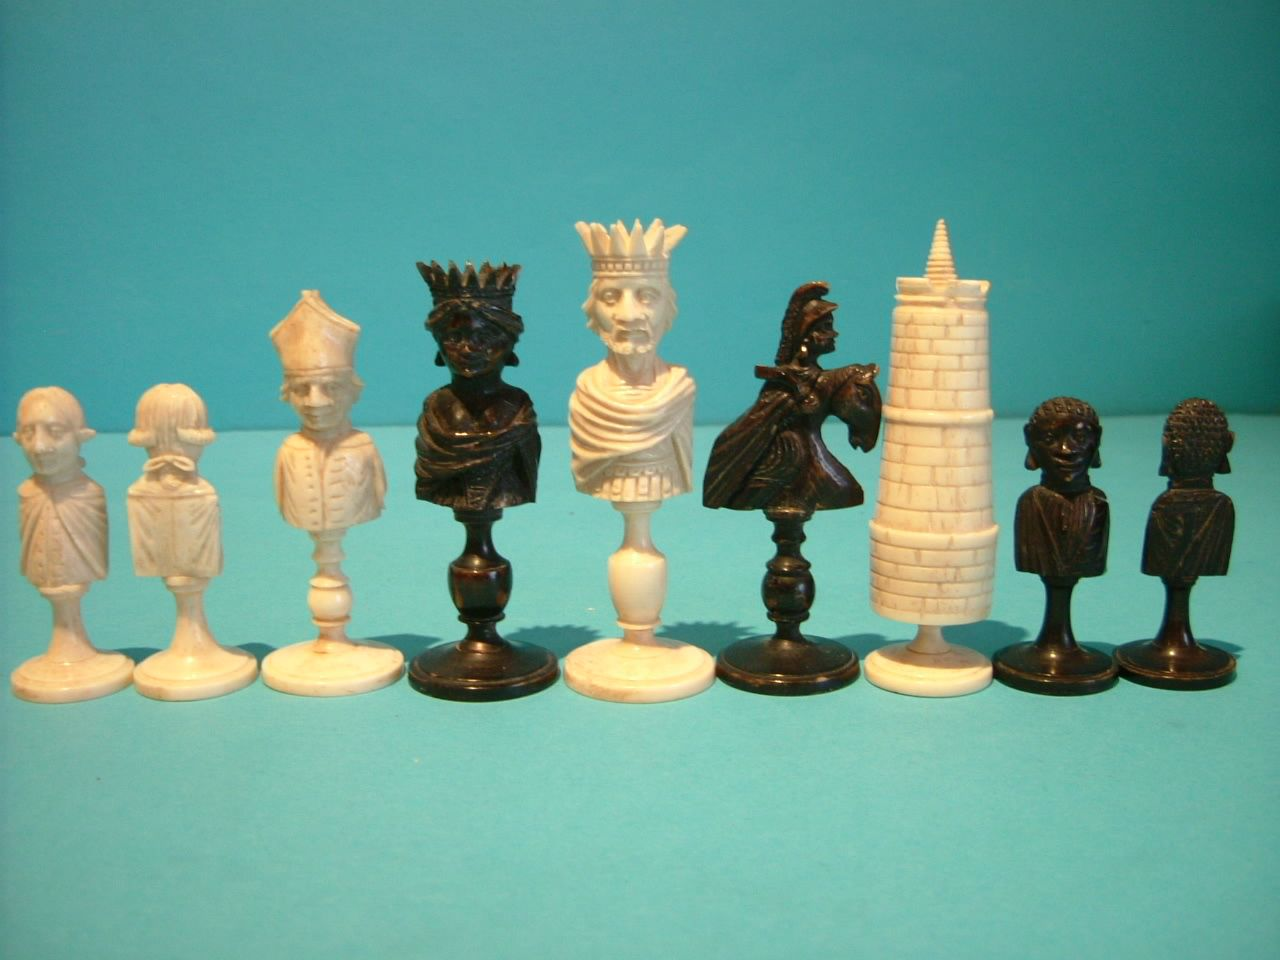 http://www.antiquechessshop.com/Images/075_03.jpg